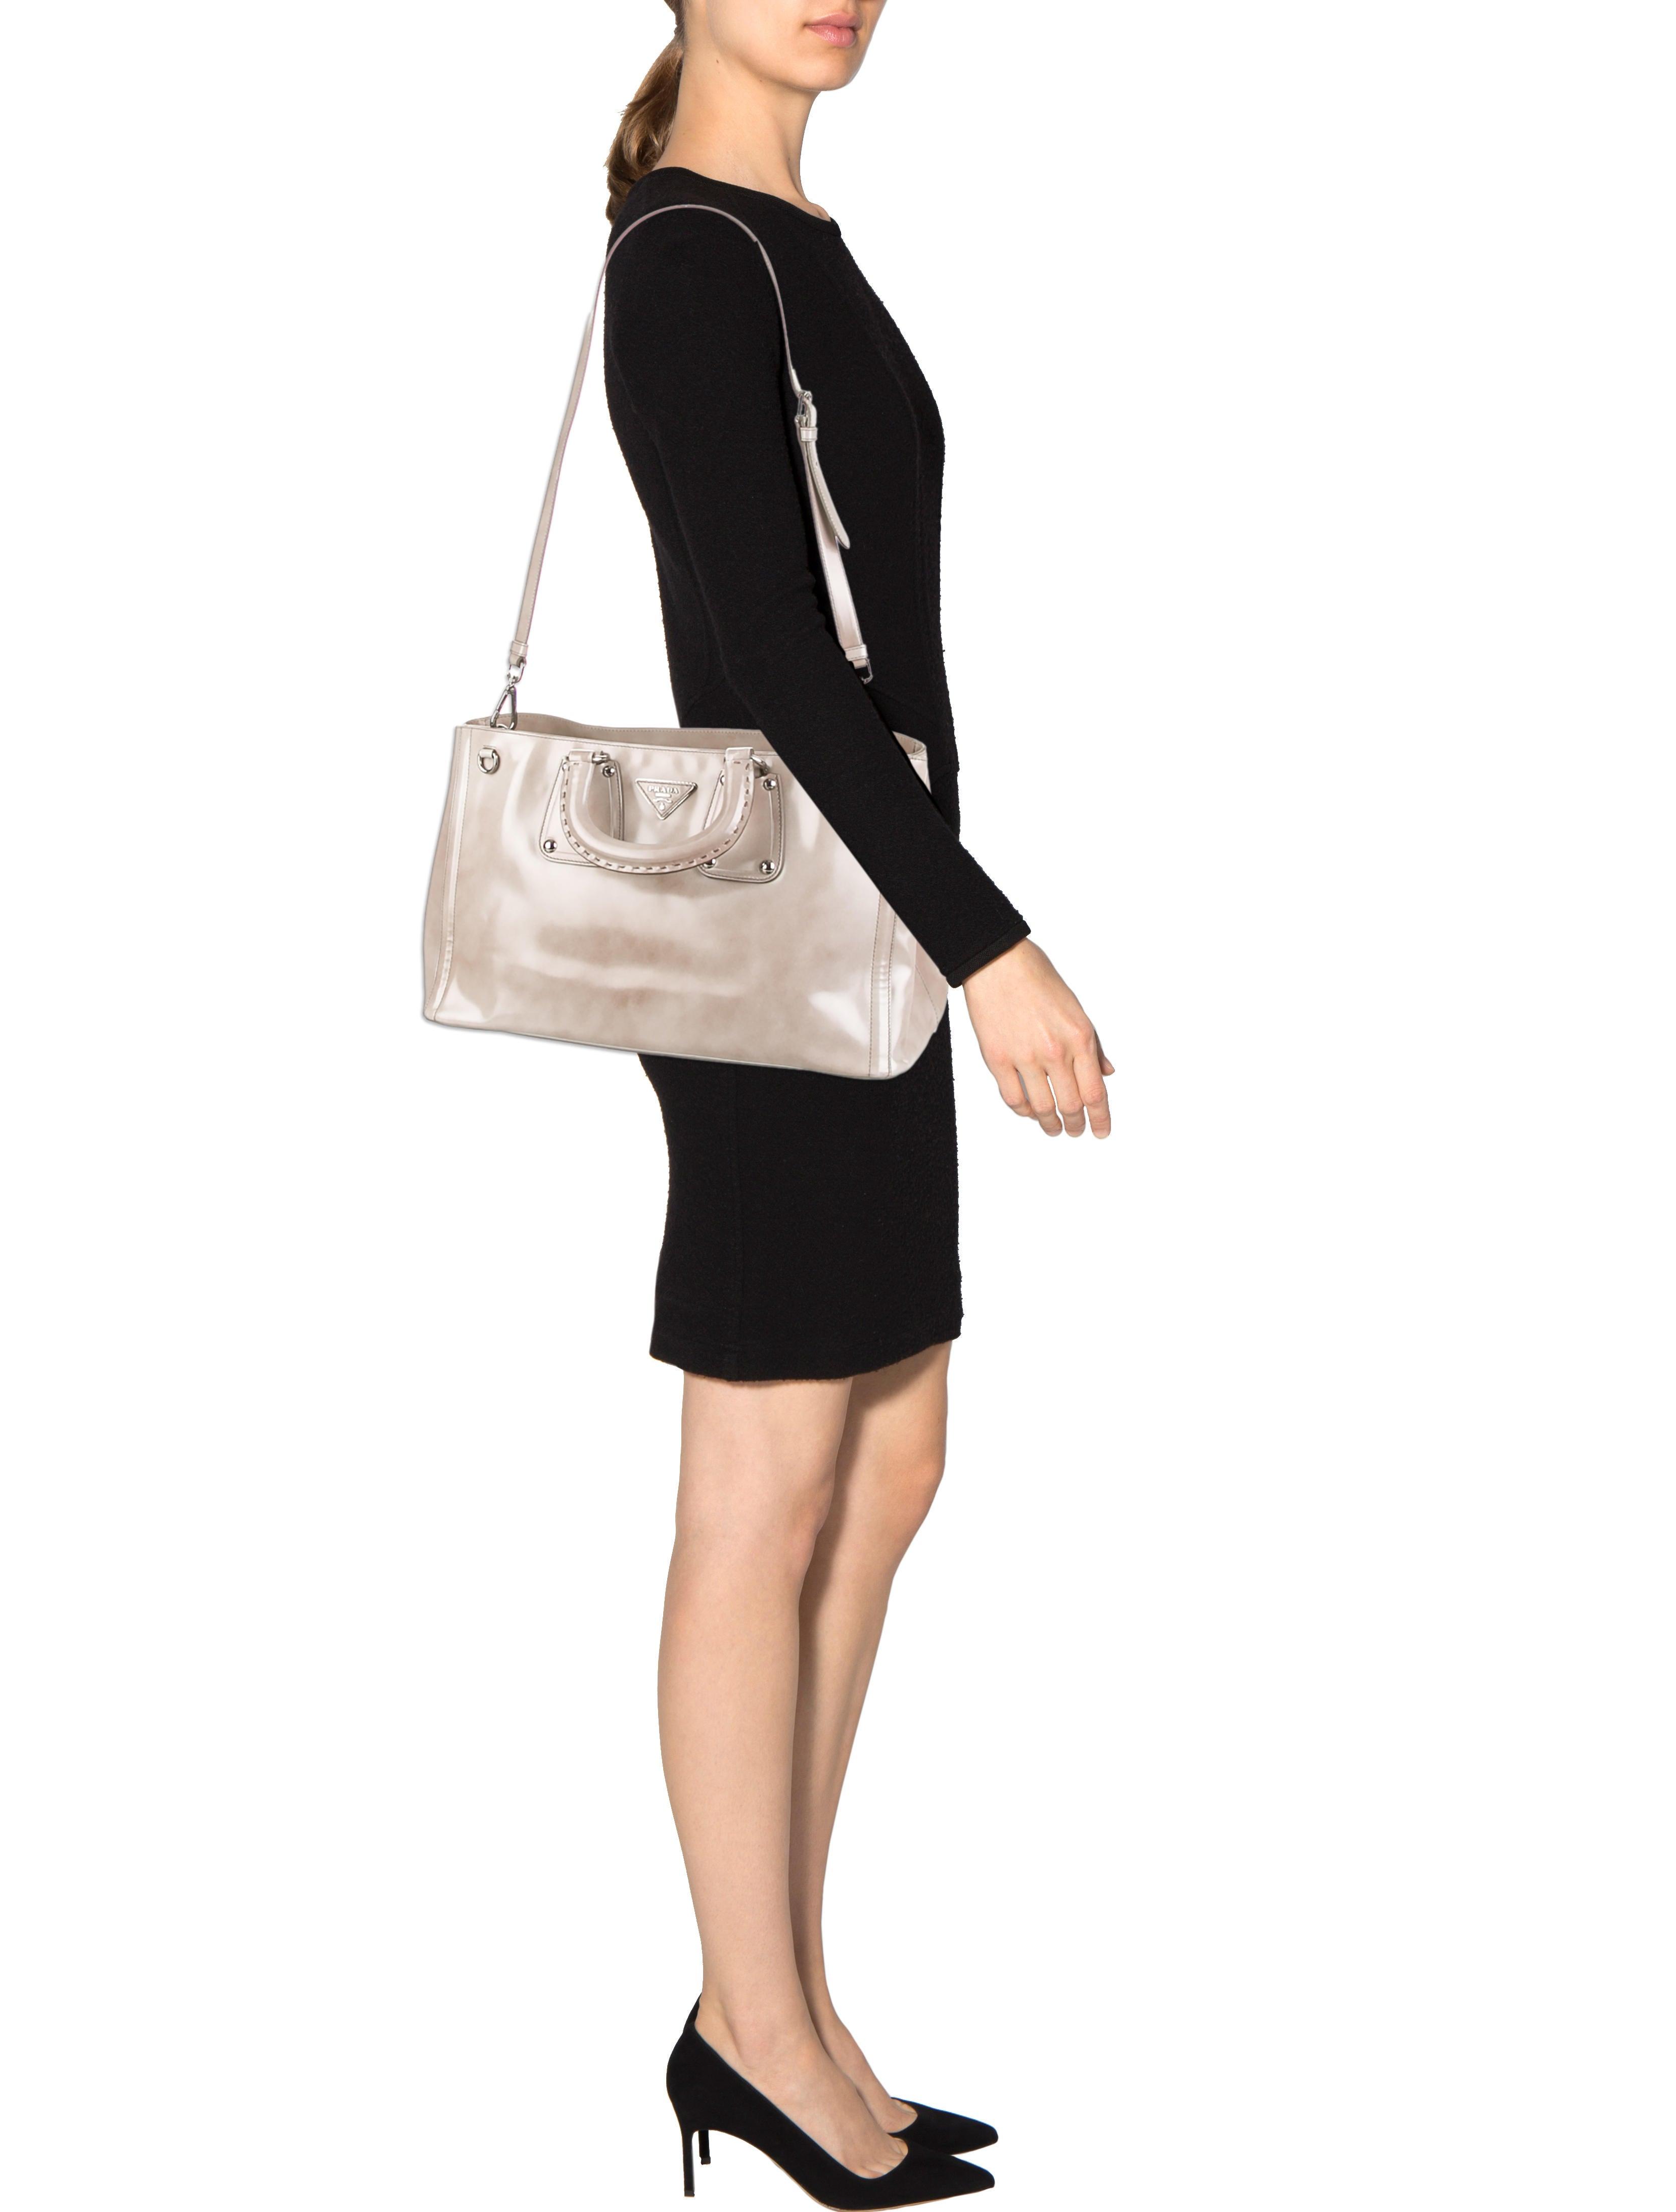 Prada Spazzolato Fume Tote - Handbags - PRA64459   The RealReal